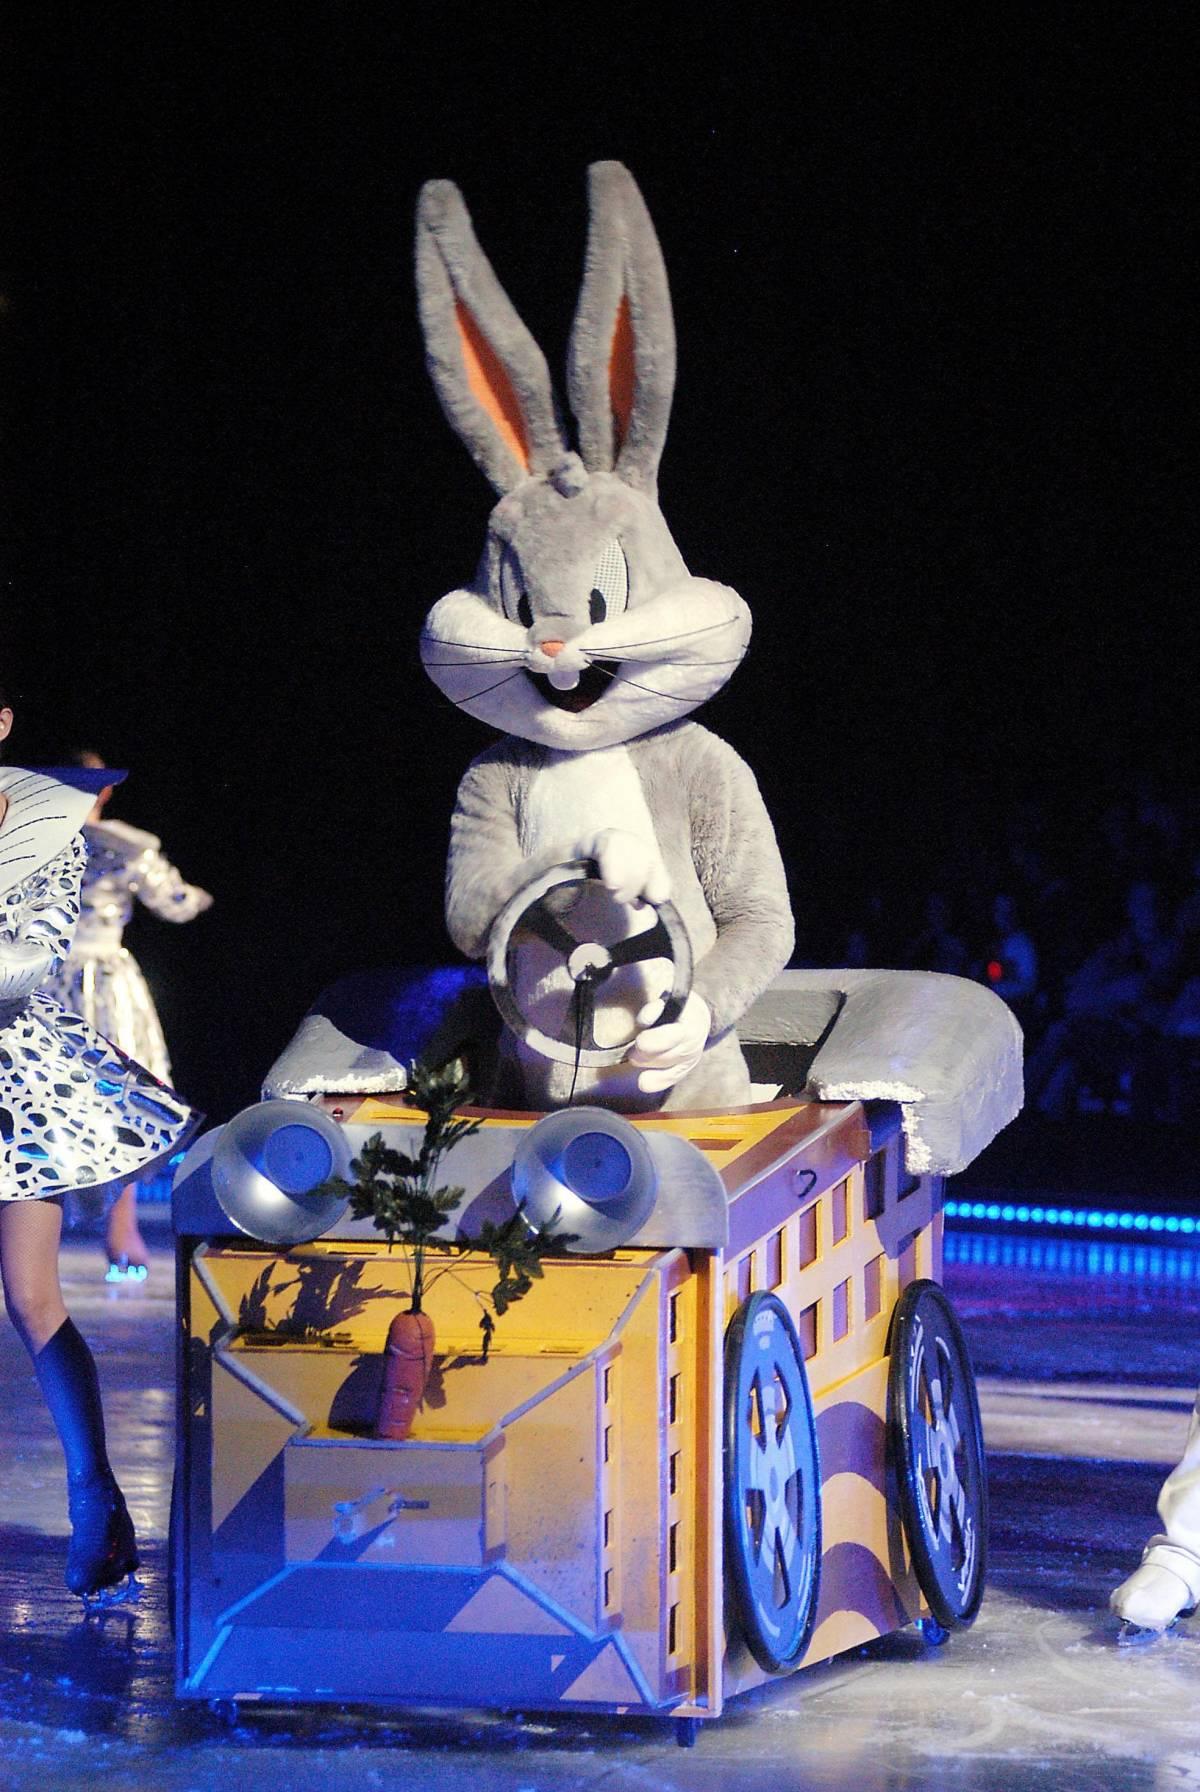 Bugs Bunny & C. sui pattini per i bambini